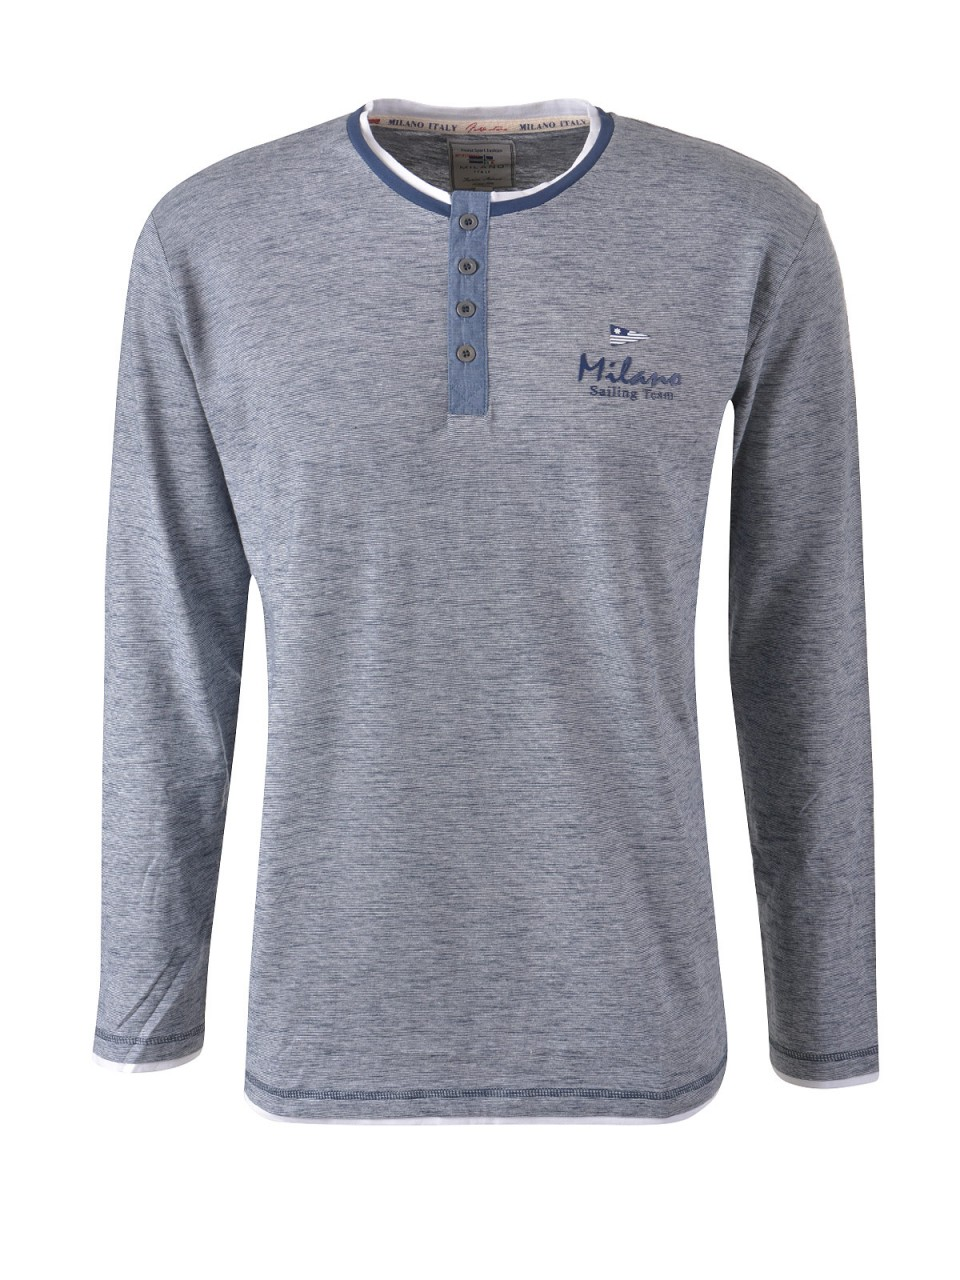 milano-italy-herren-shirt-navy-wei-szlig-